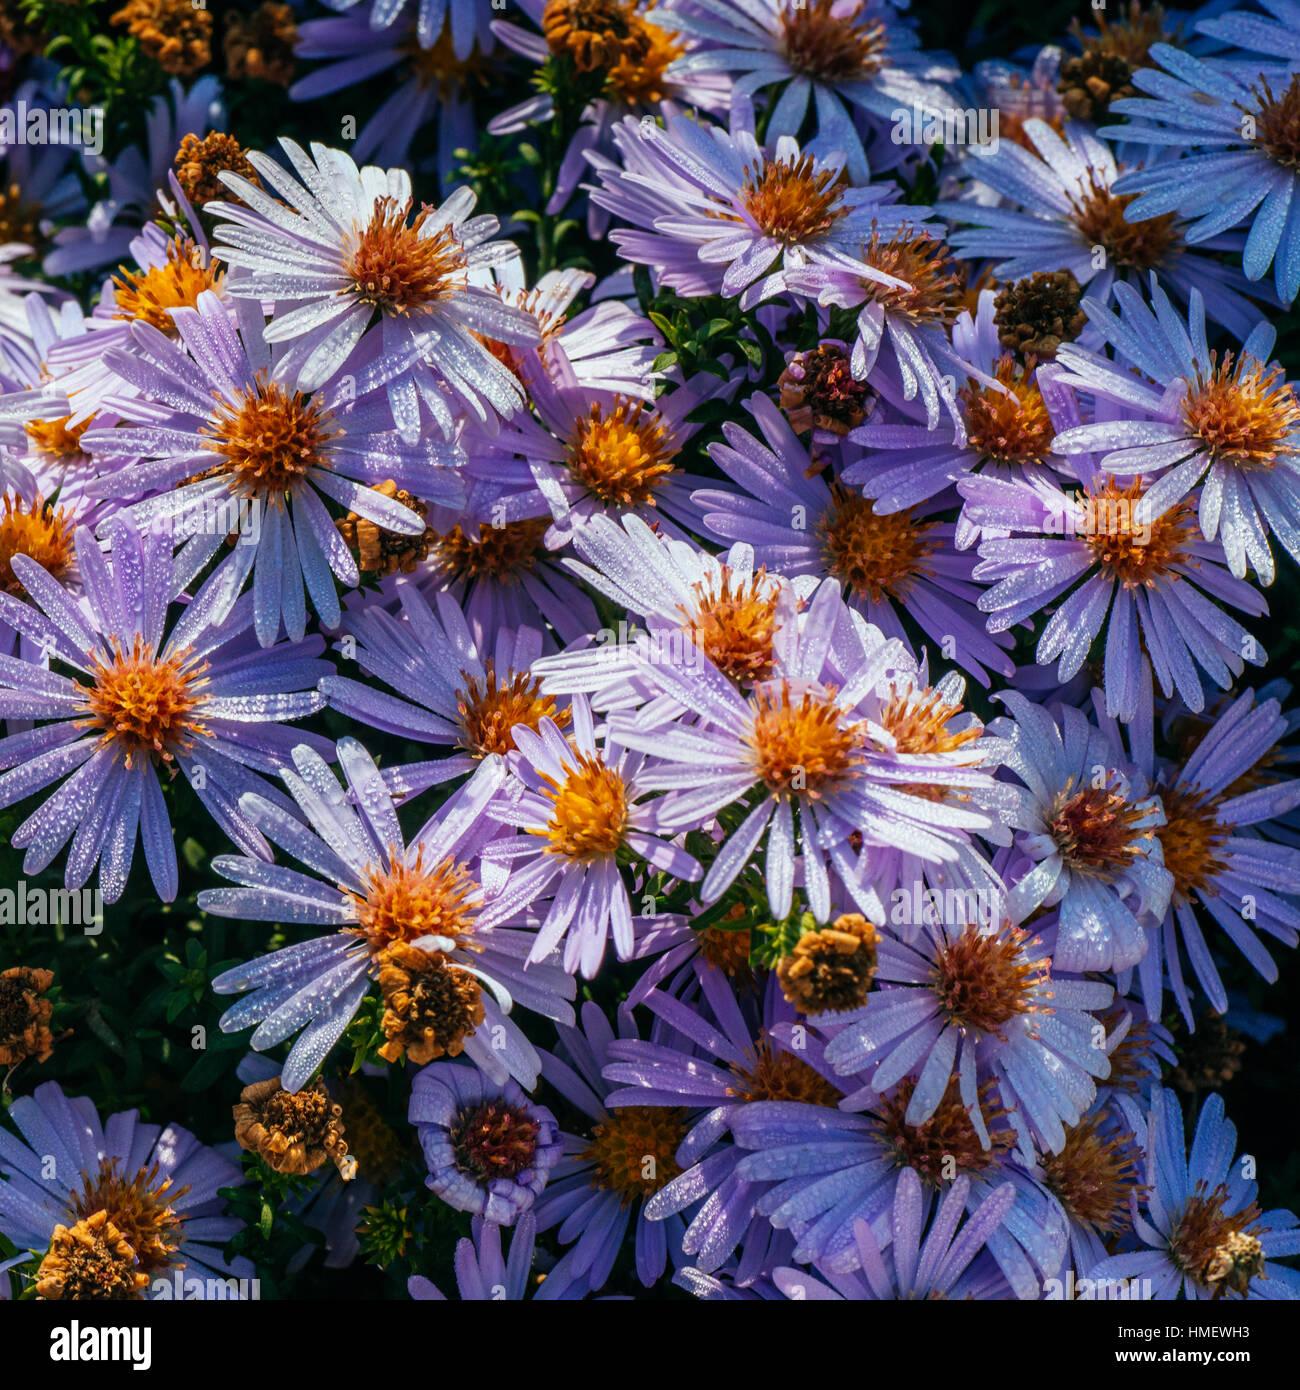 Magenta aster flowerbed under sunlight - Stock Image